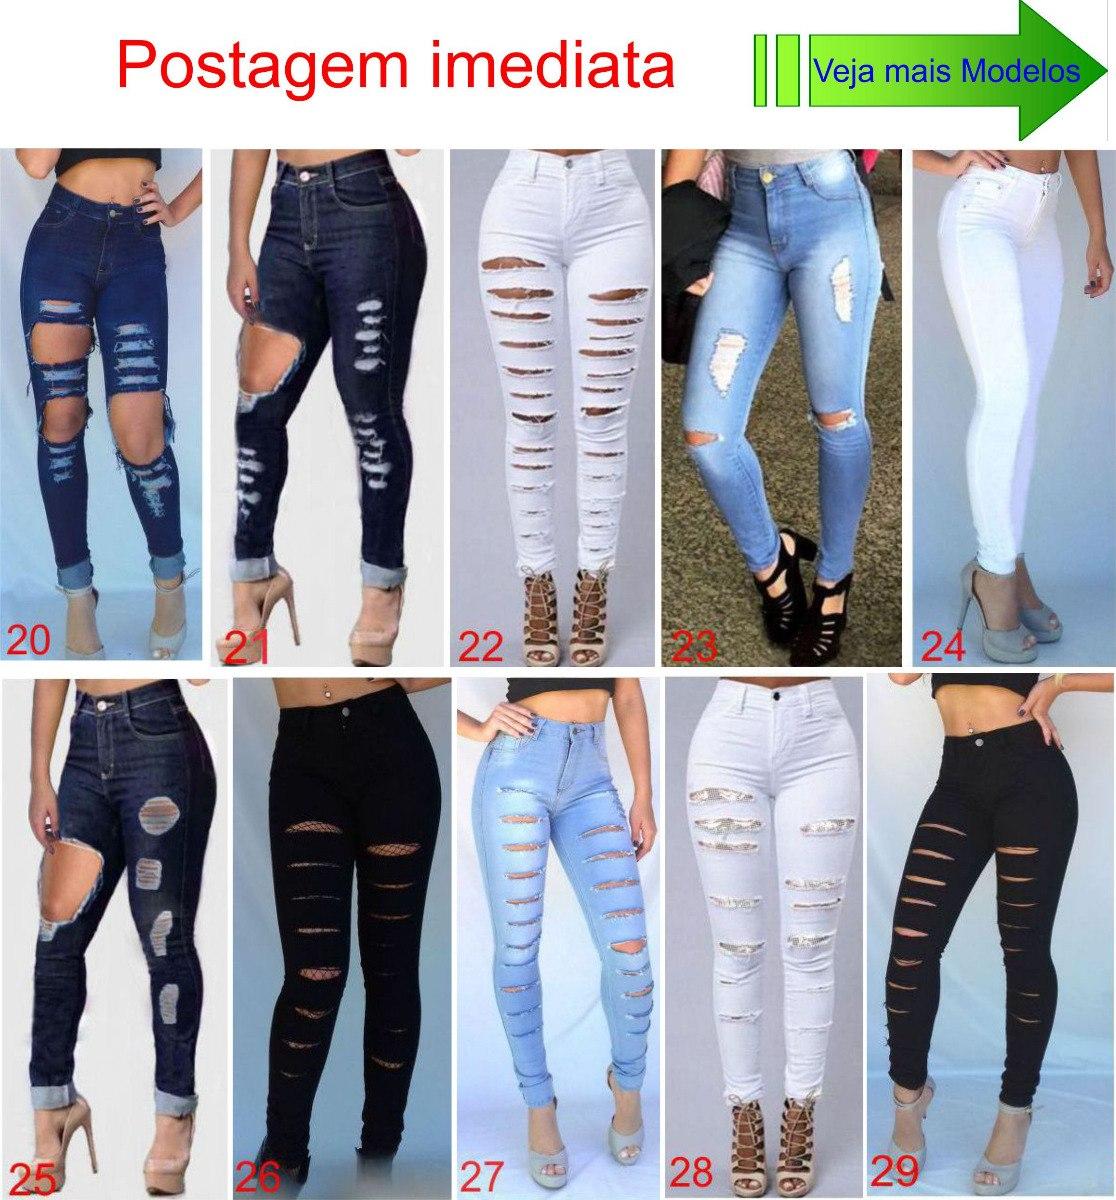 1eec1ca65 Carregando zoom... calça jeans roupa feminina cintura alta dins rasgada ...